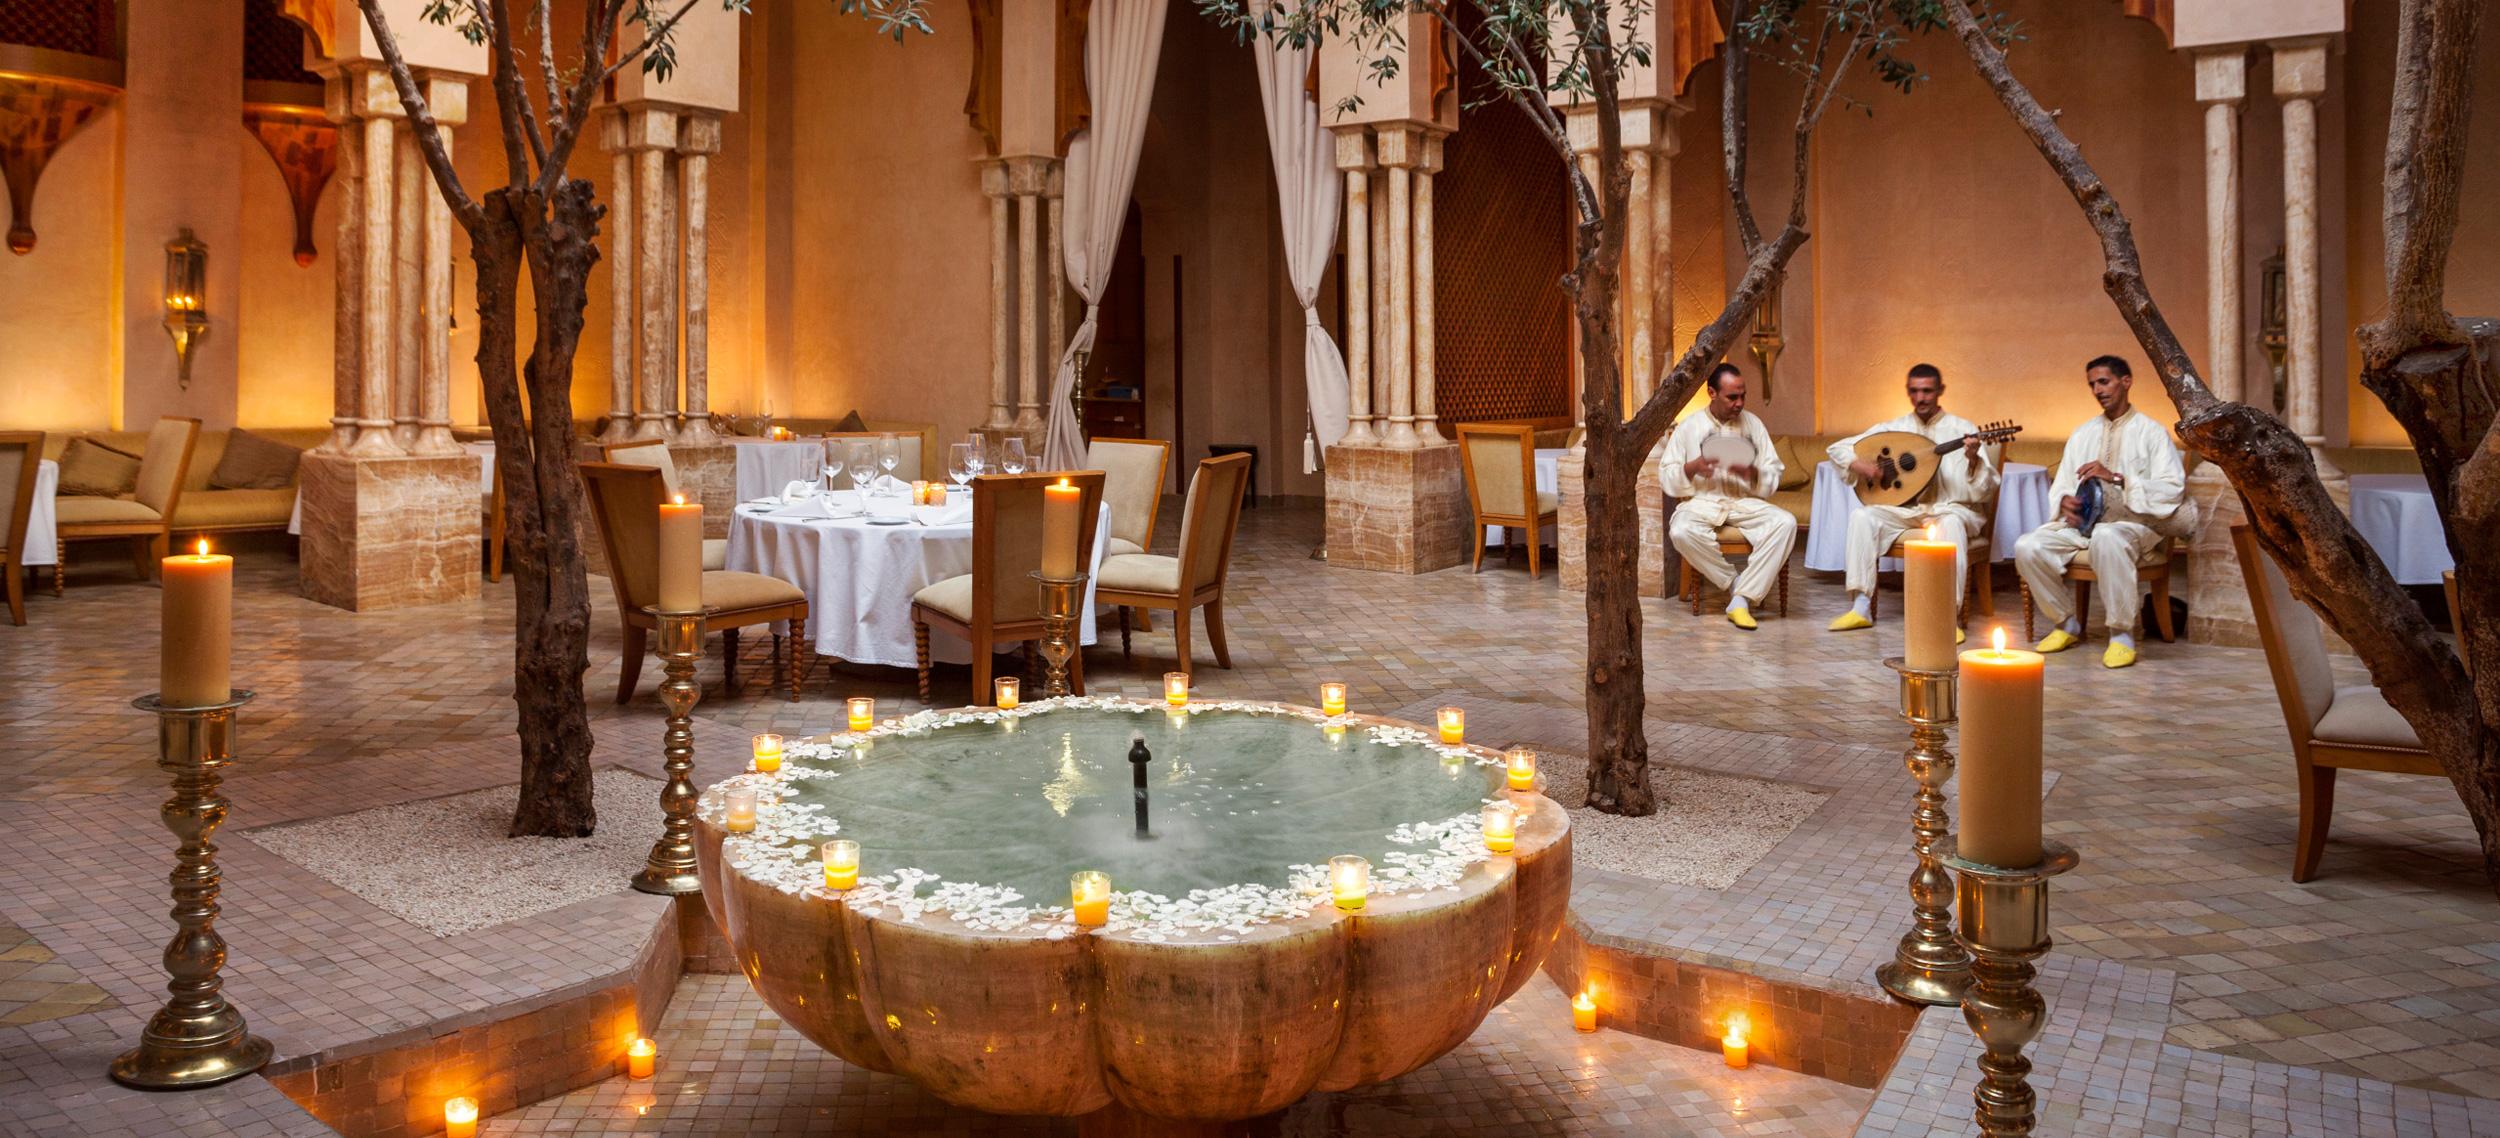 Dating ritualer i Grekland